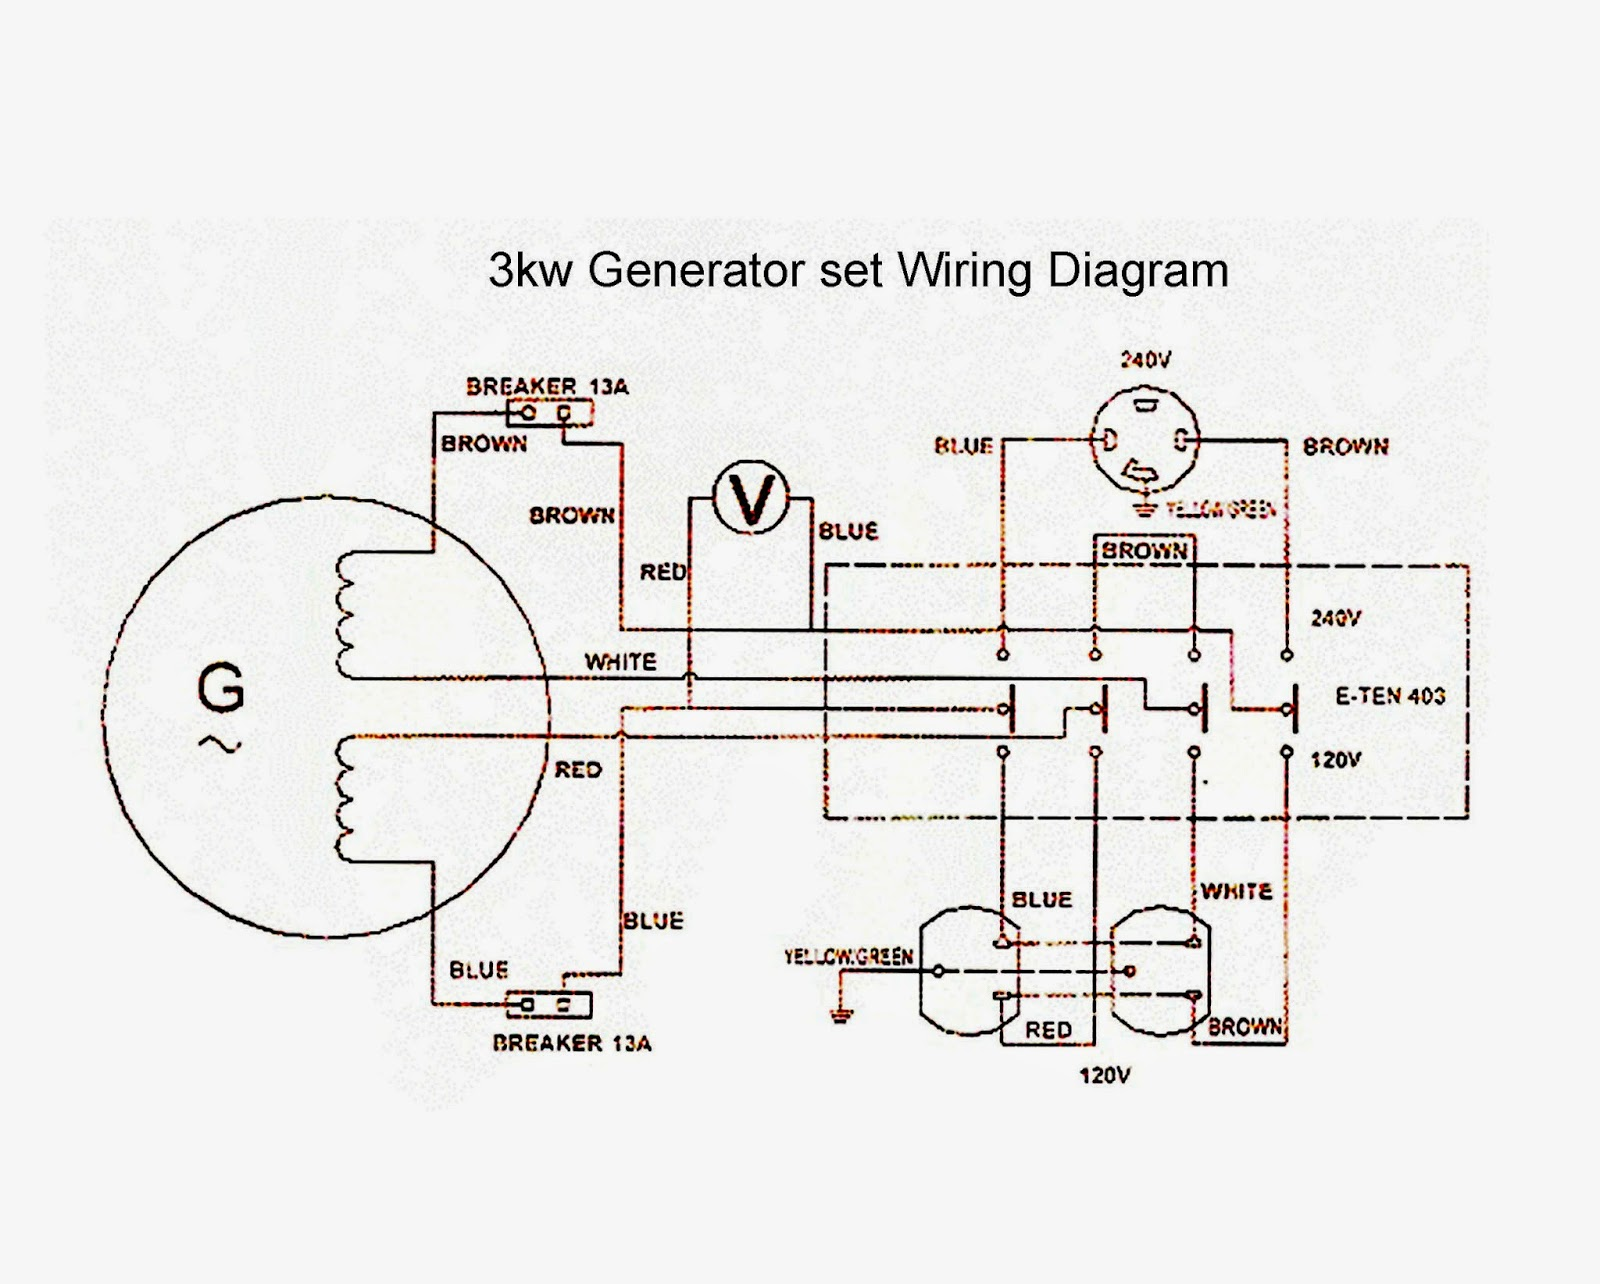 Awesome Generator Wiring Schematic Model A Wiring Diagram Wiring Cloud Rineaidewilluminateatxorg